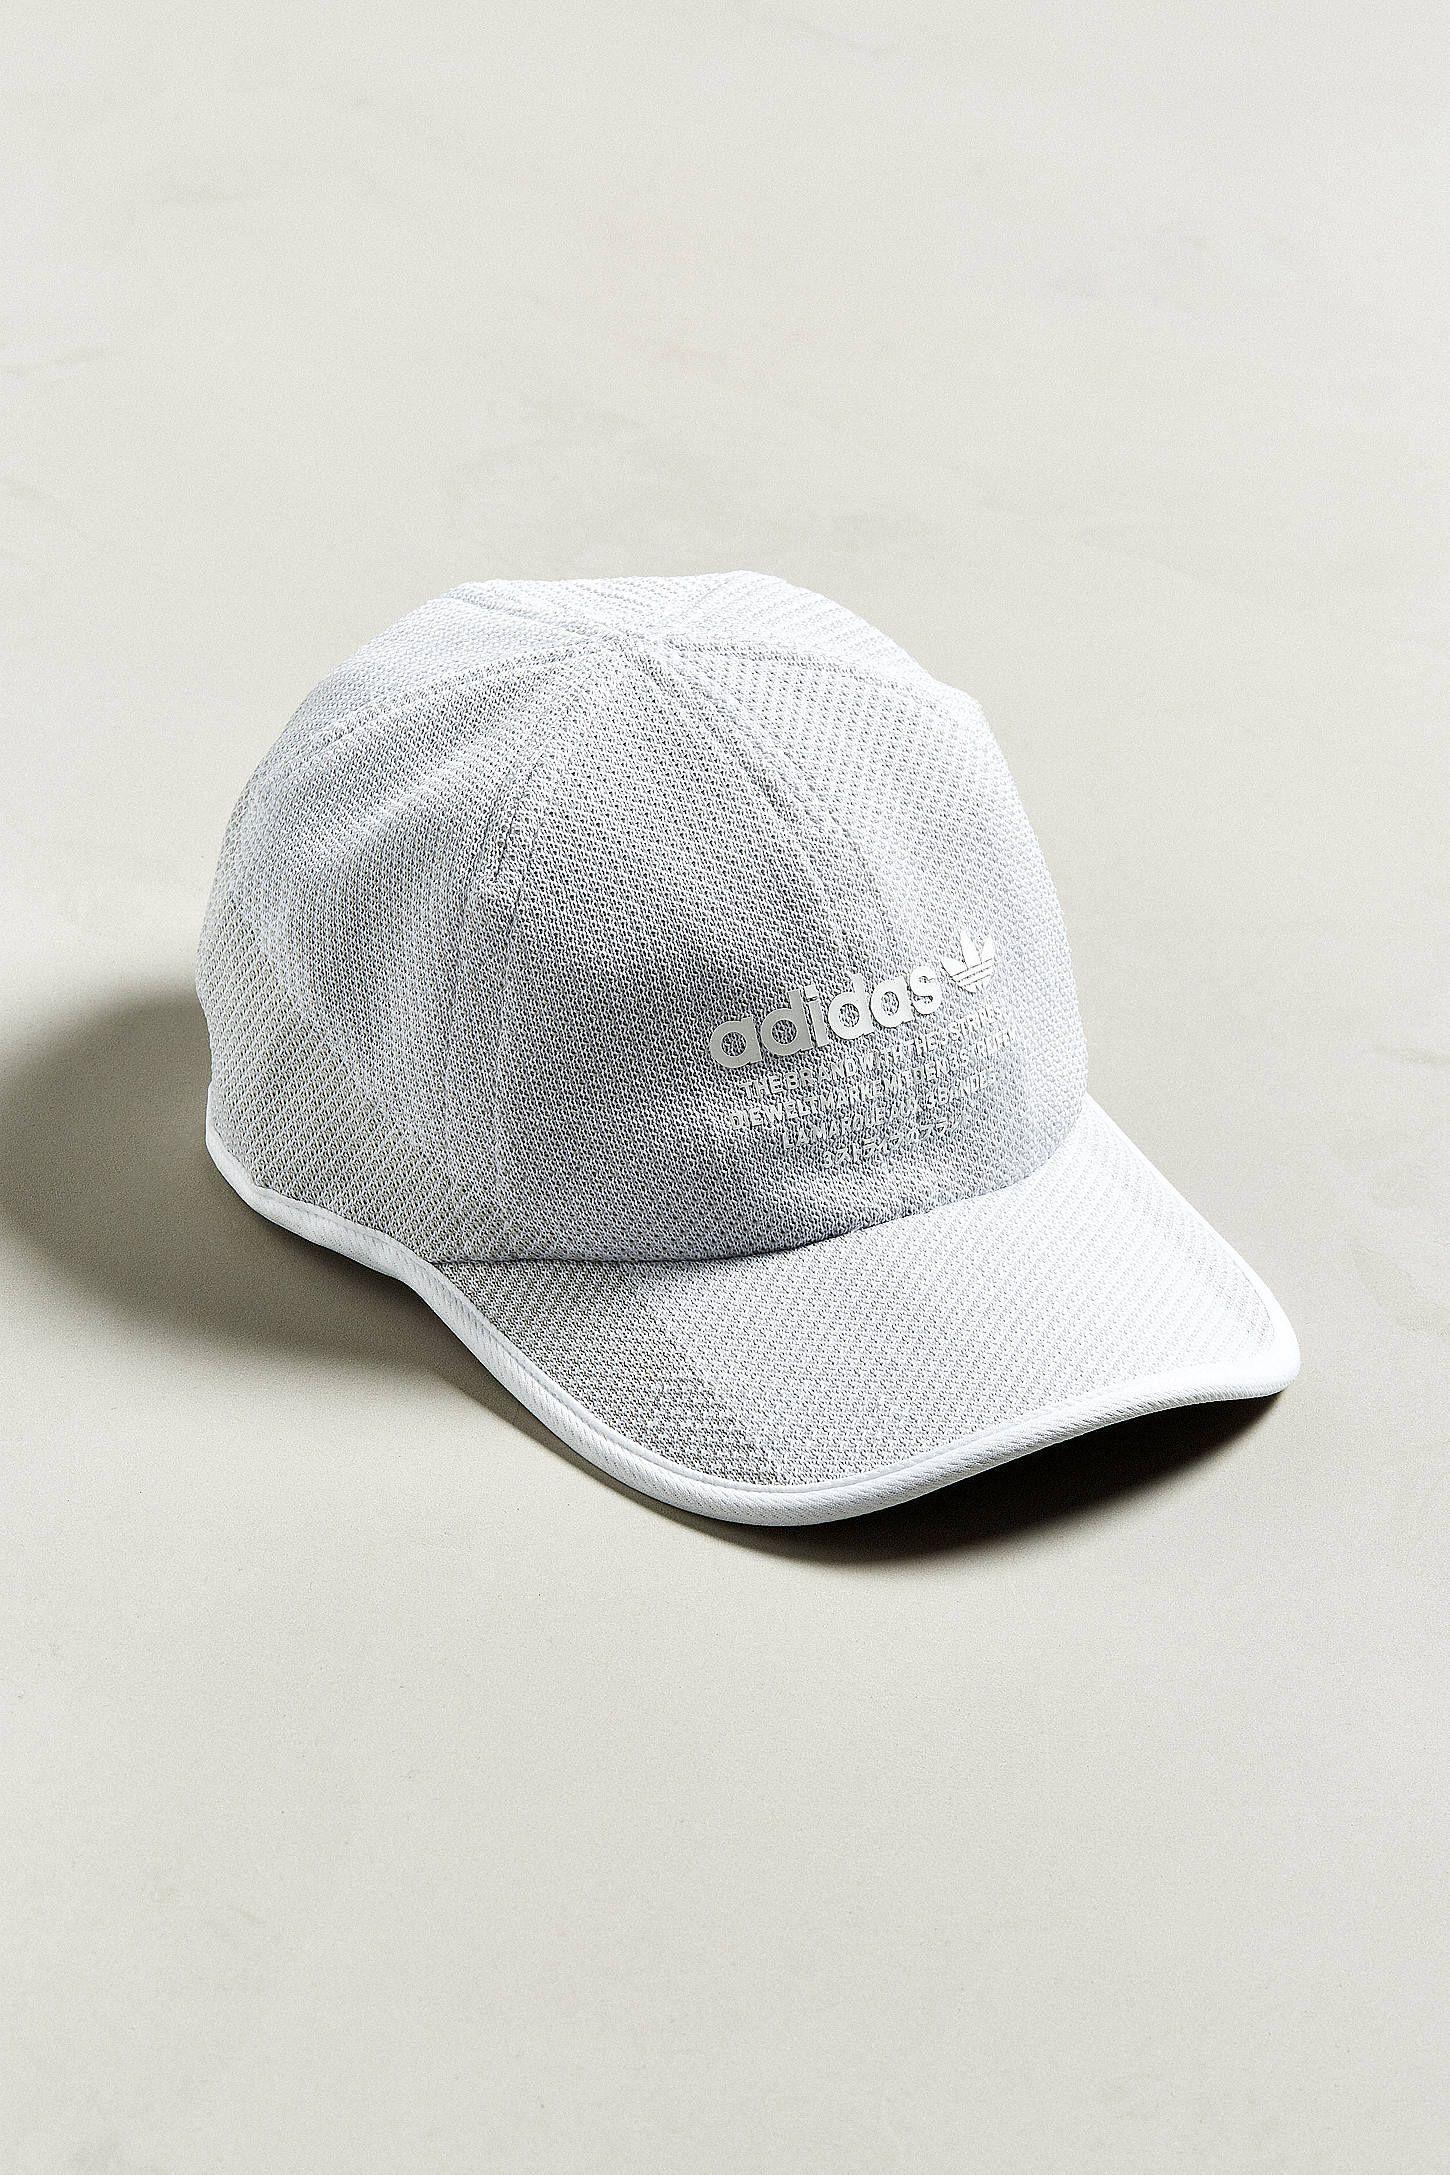 adidas originali nmd primo ii cappello pinterest nmd, adidas e